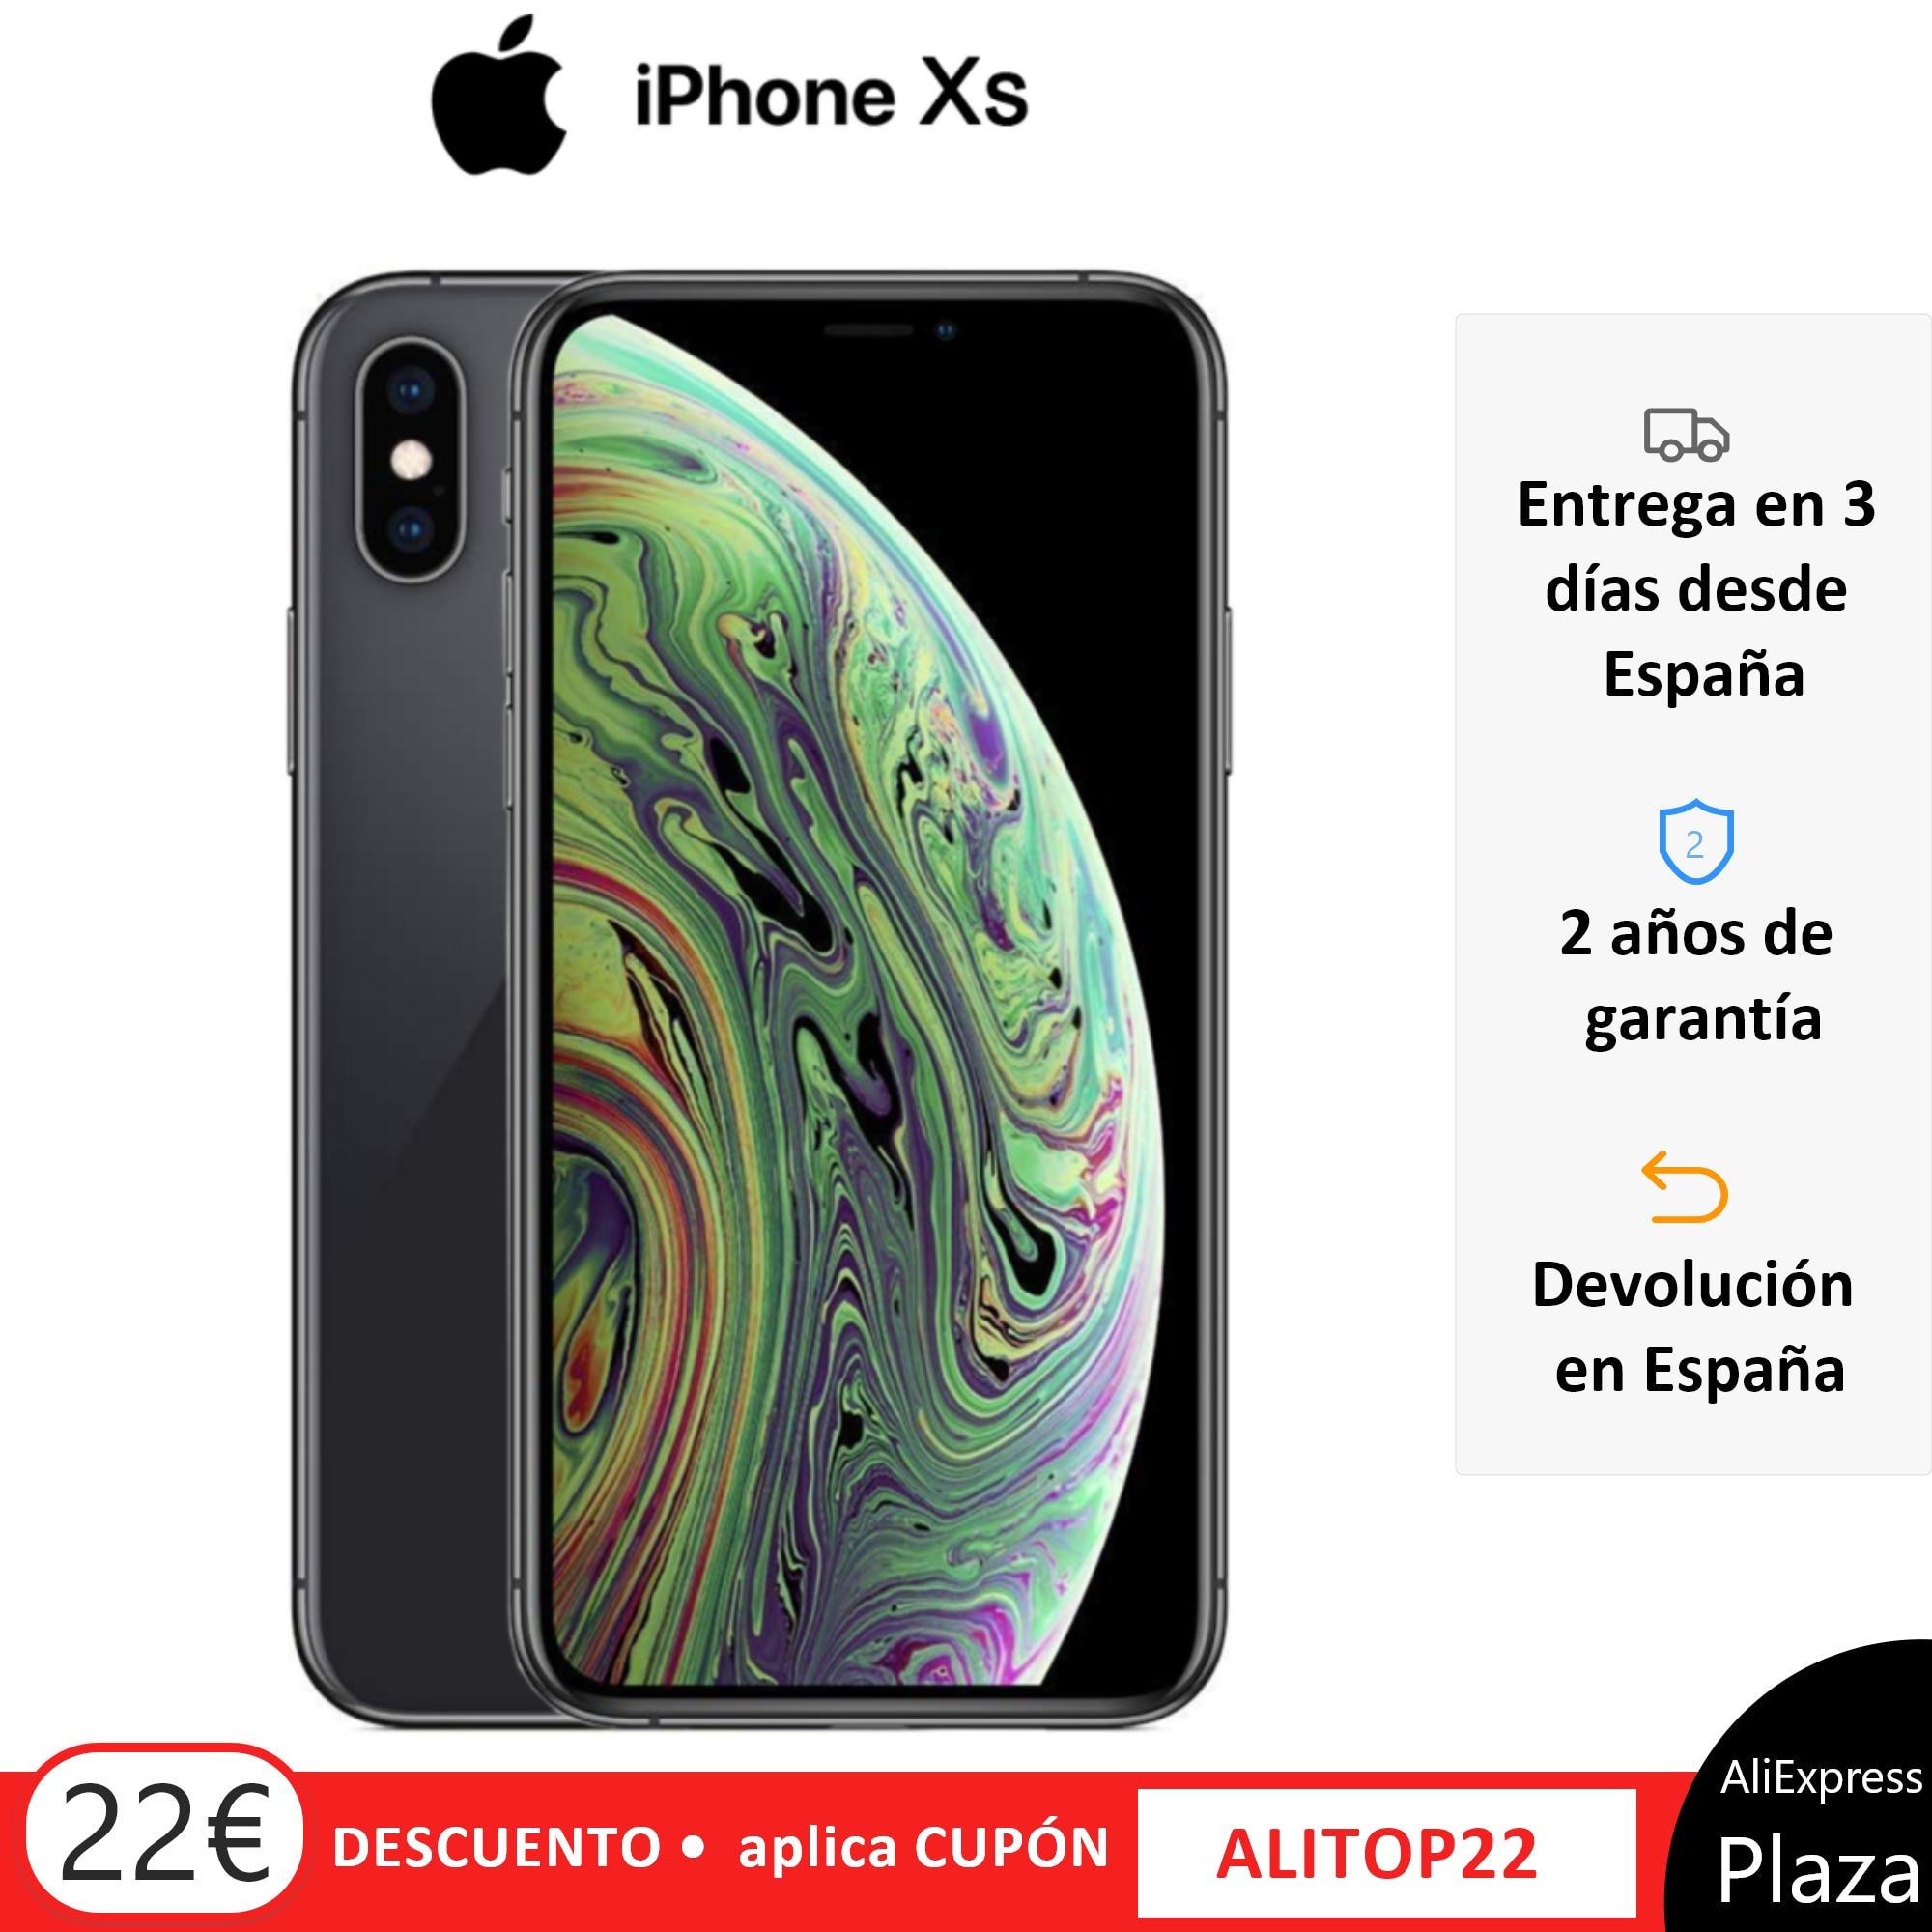 aliexpress plaza funda iphone 7